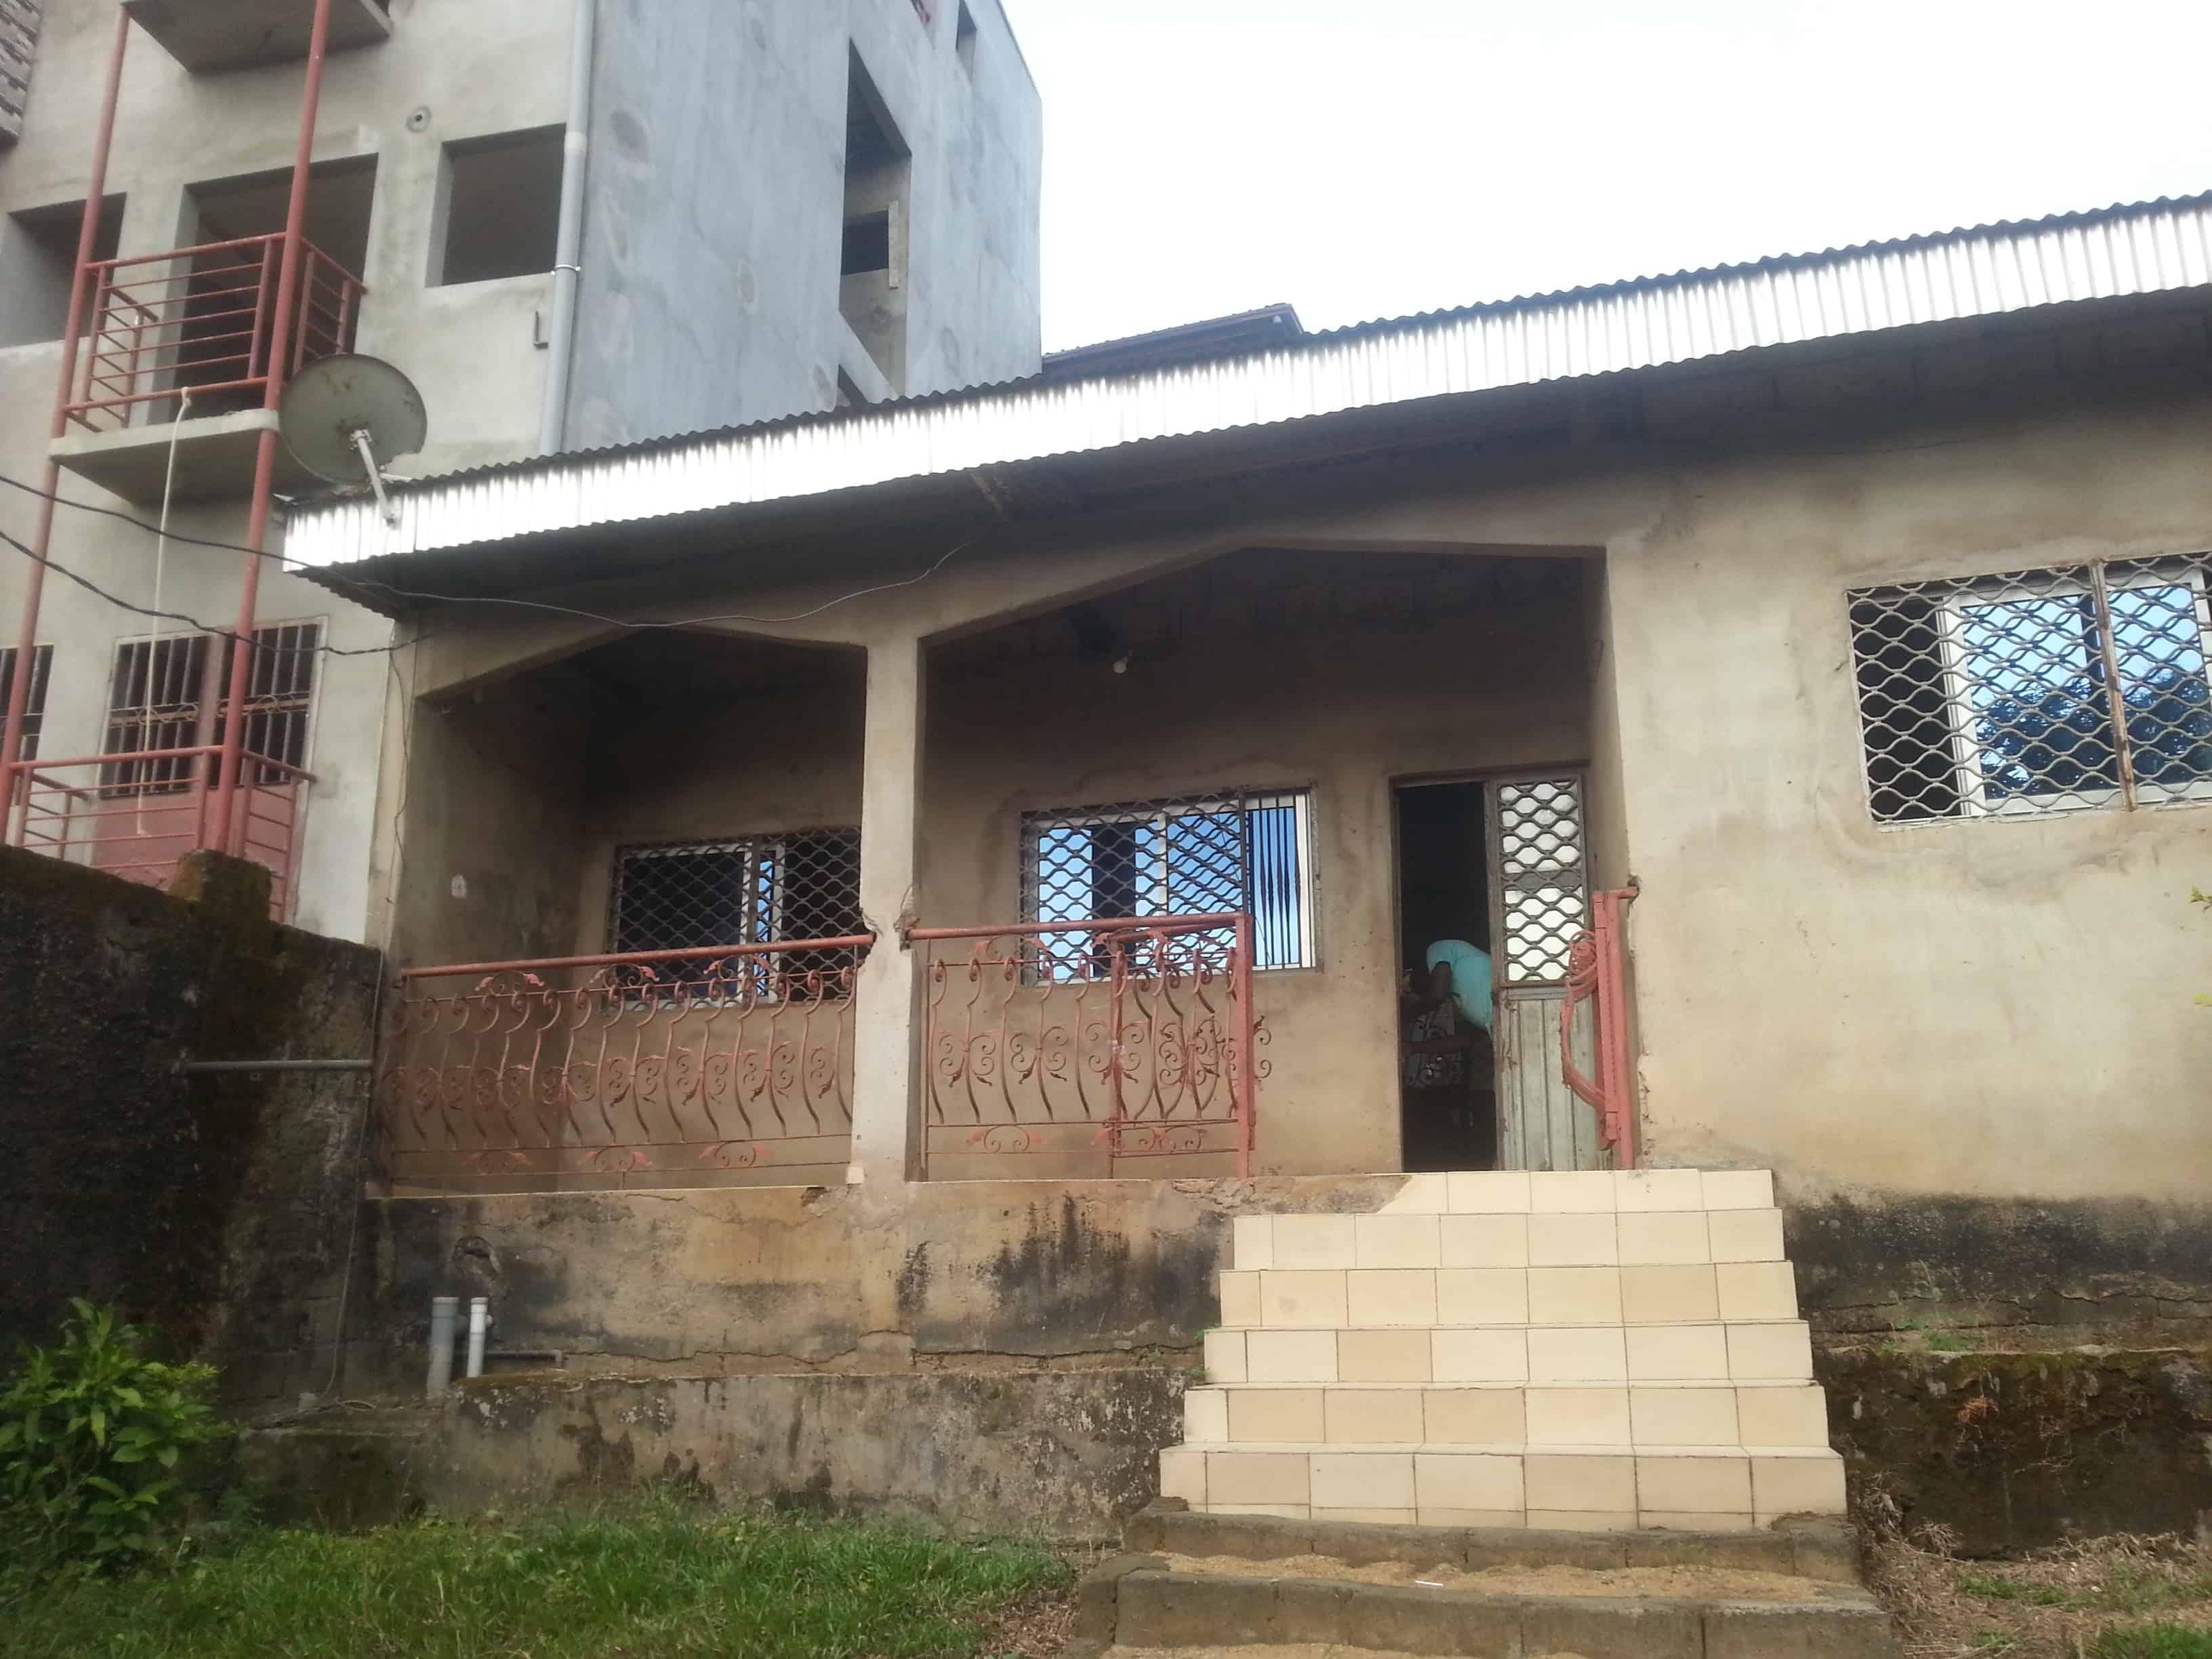 House (Villa) for sale - Douala, Logpom, chefferie bendel city - 1 living room(s), 3 bedroom(s), 2 bathroom(s) - 25 000 000 FCFA / month